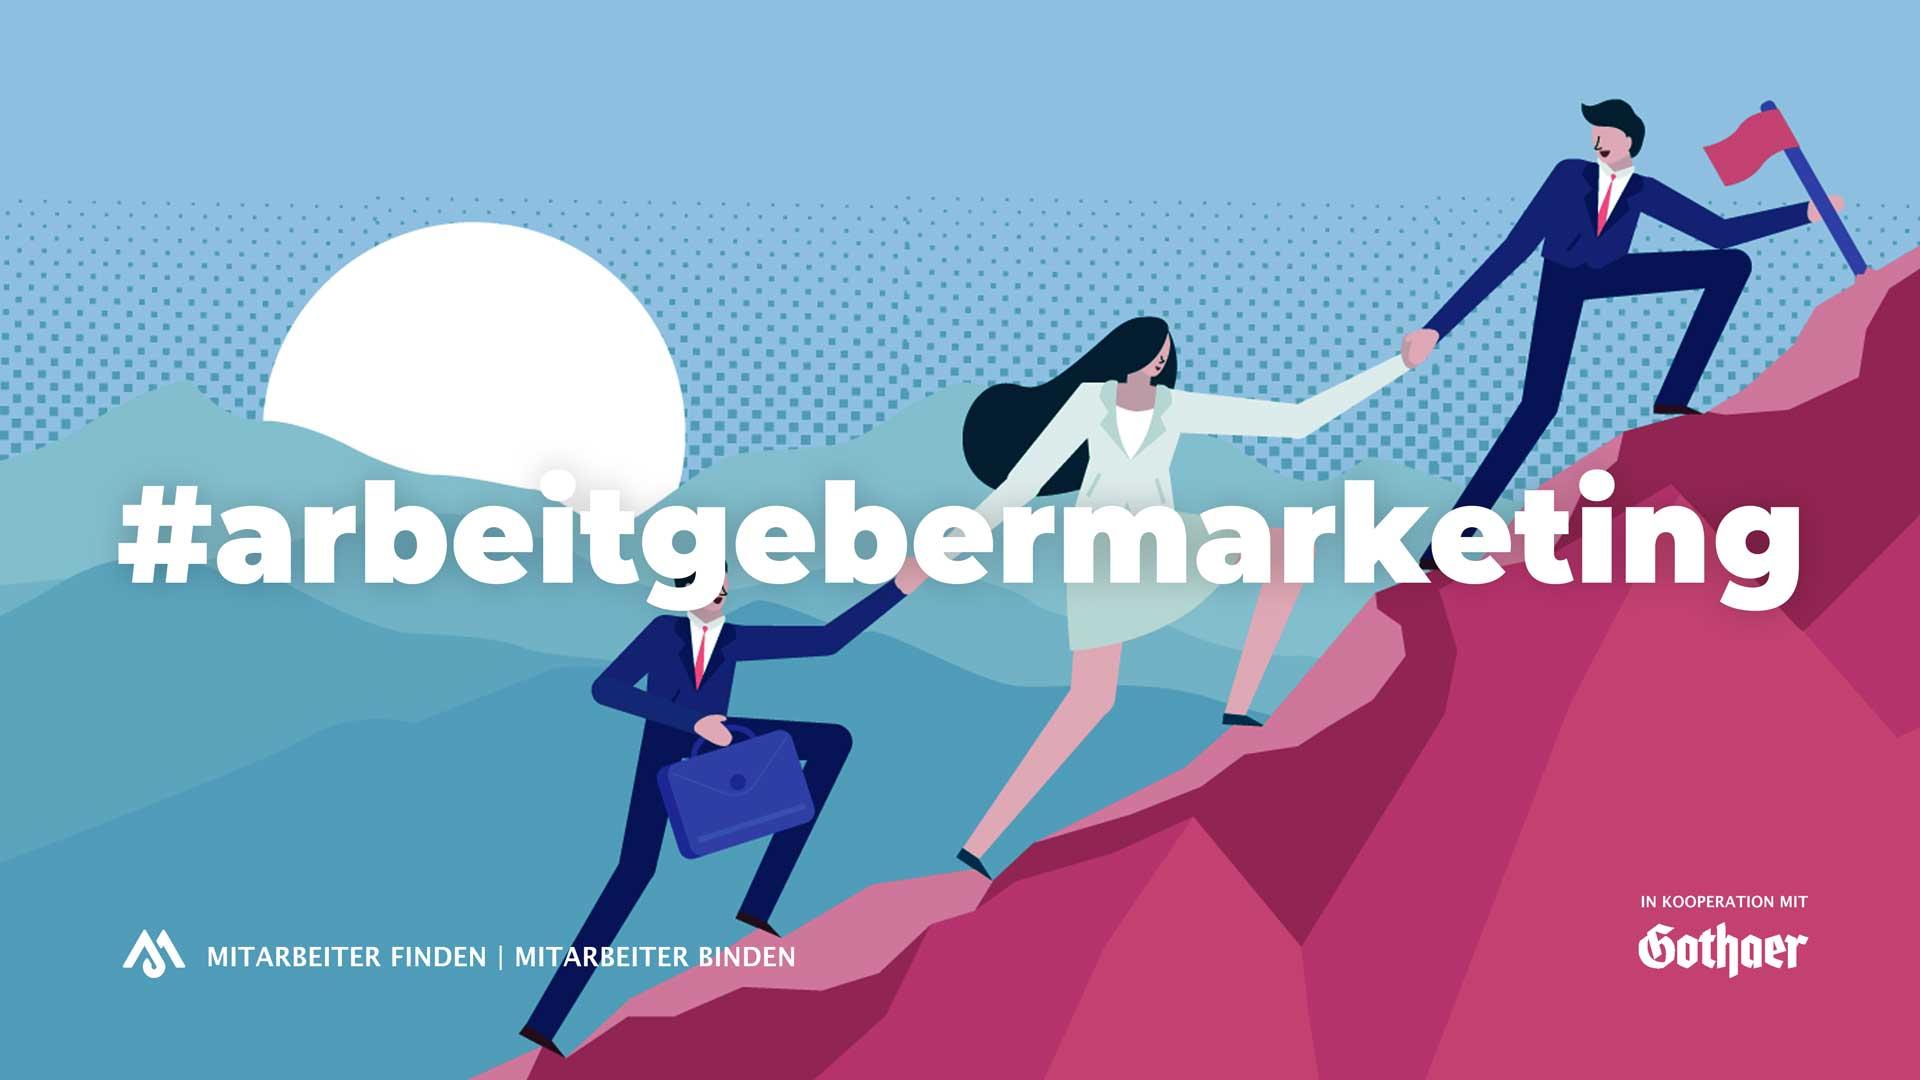 Arbeitgebermarketing